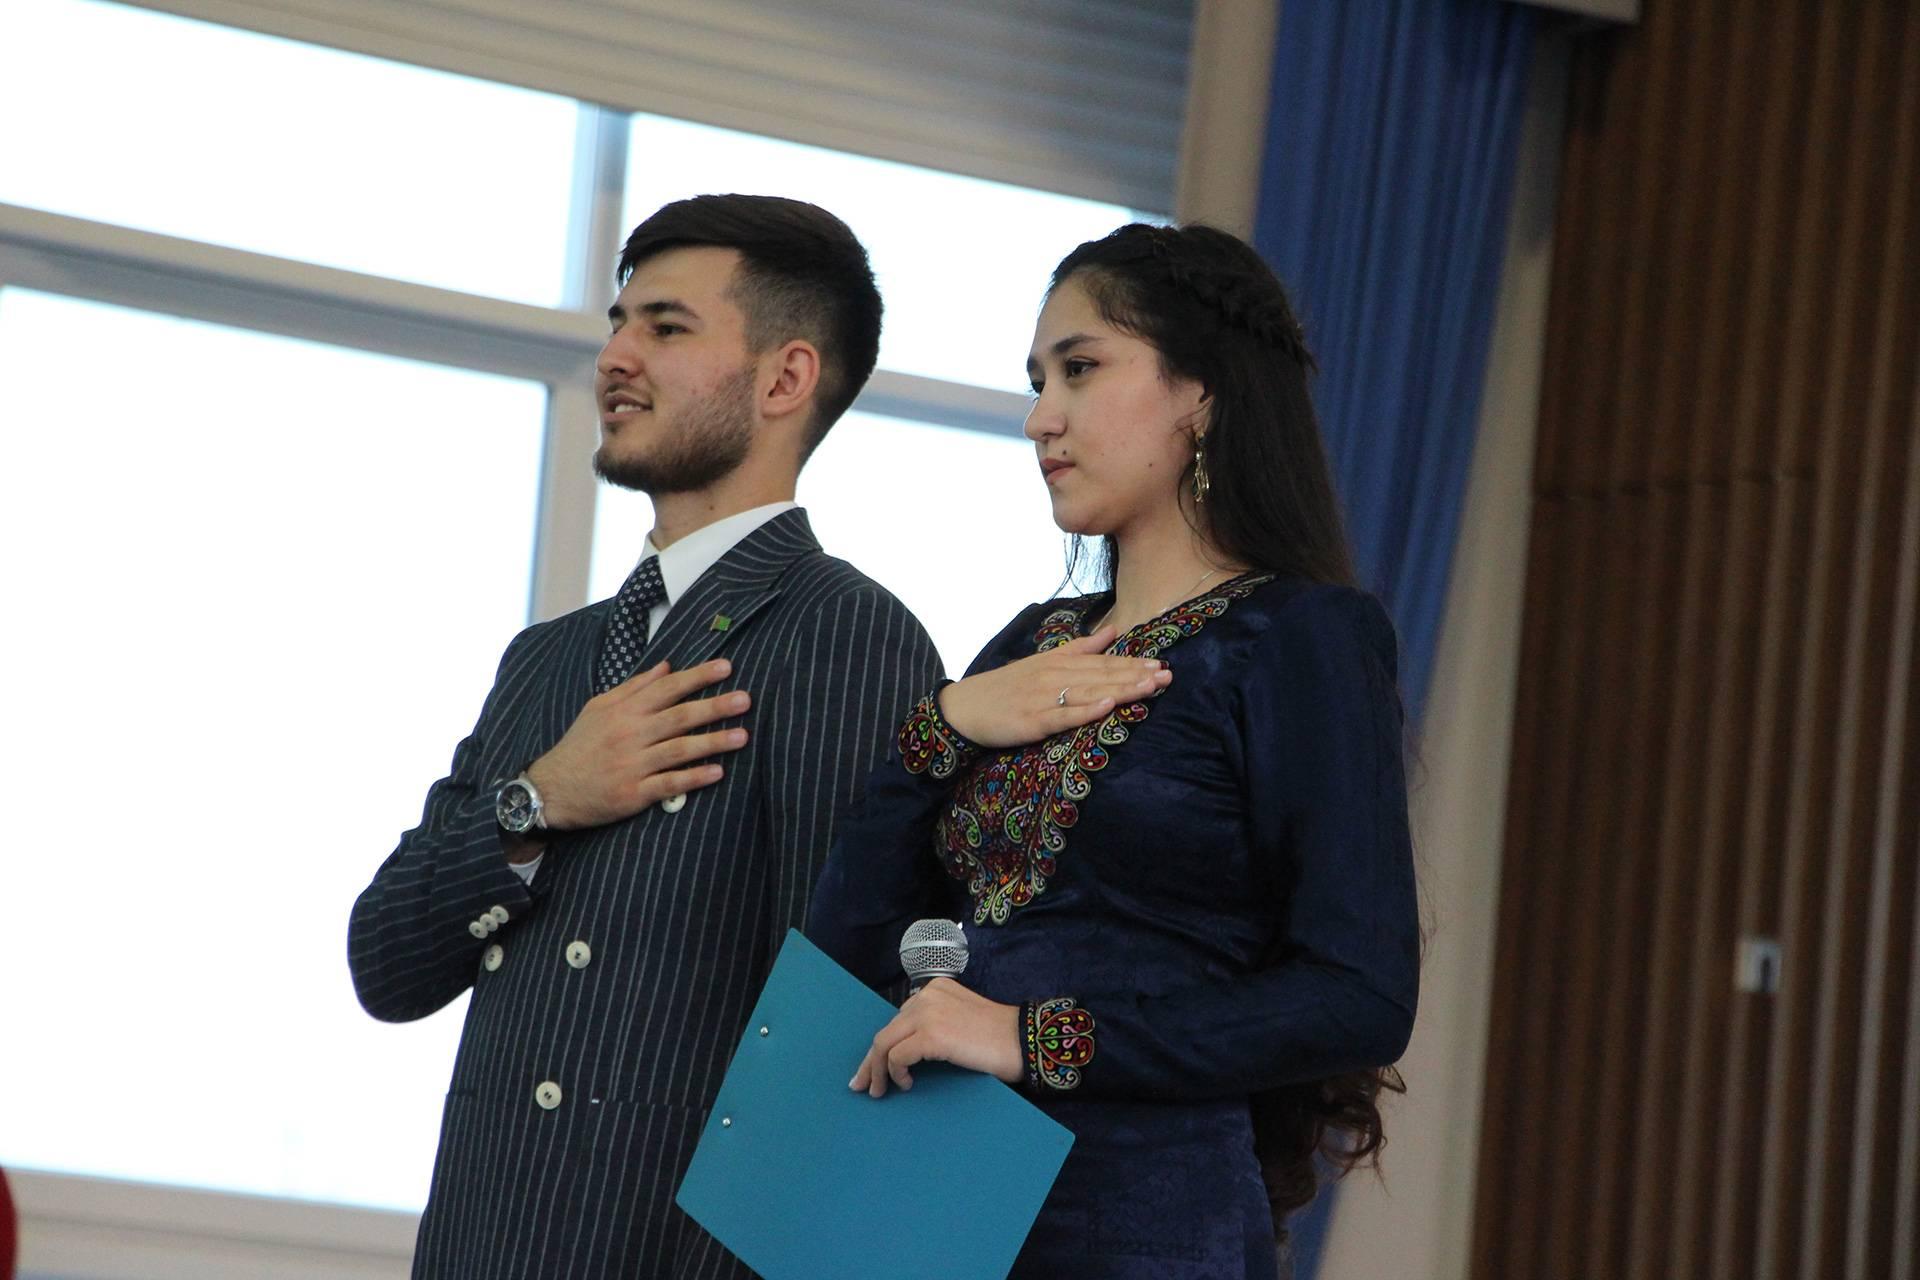 День независимости Туркменистана отметили в Чувашии